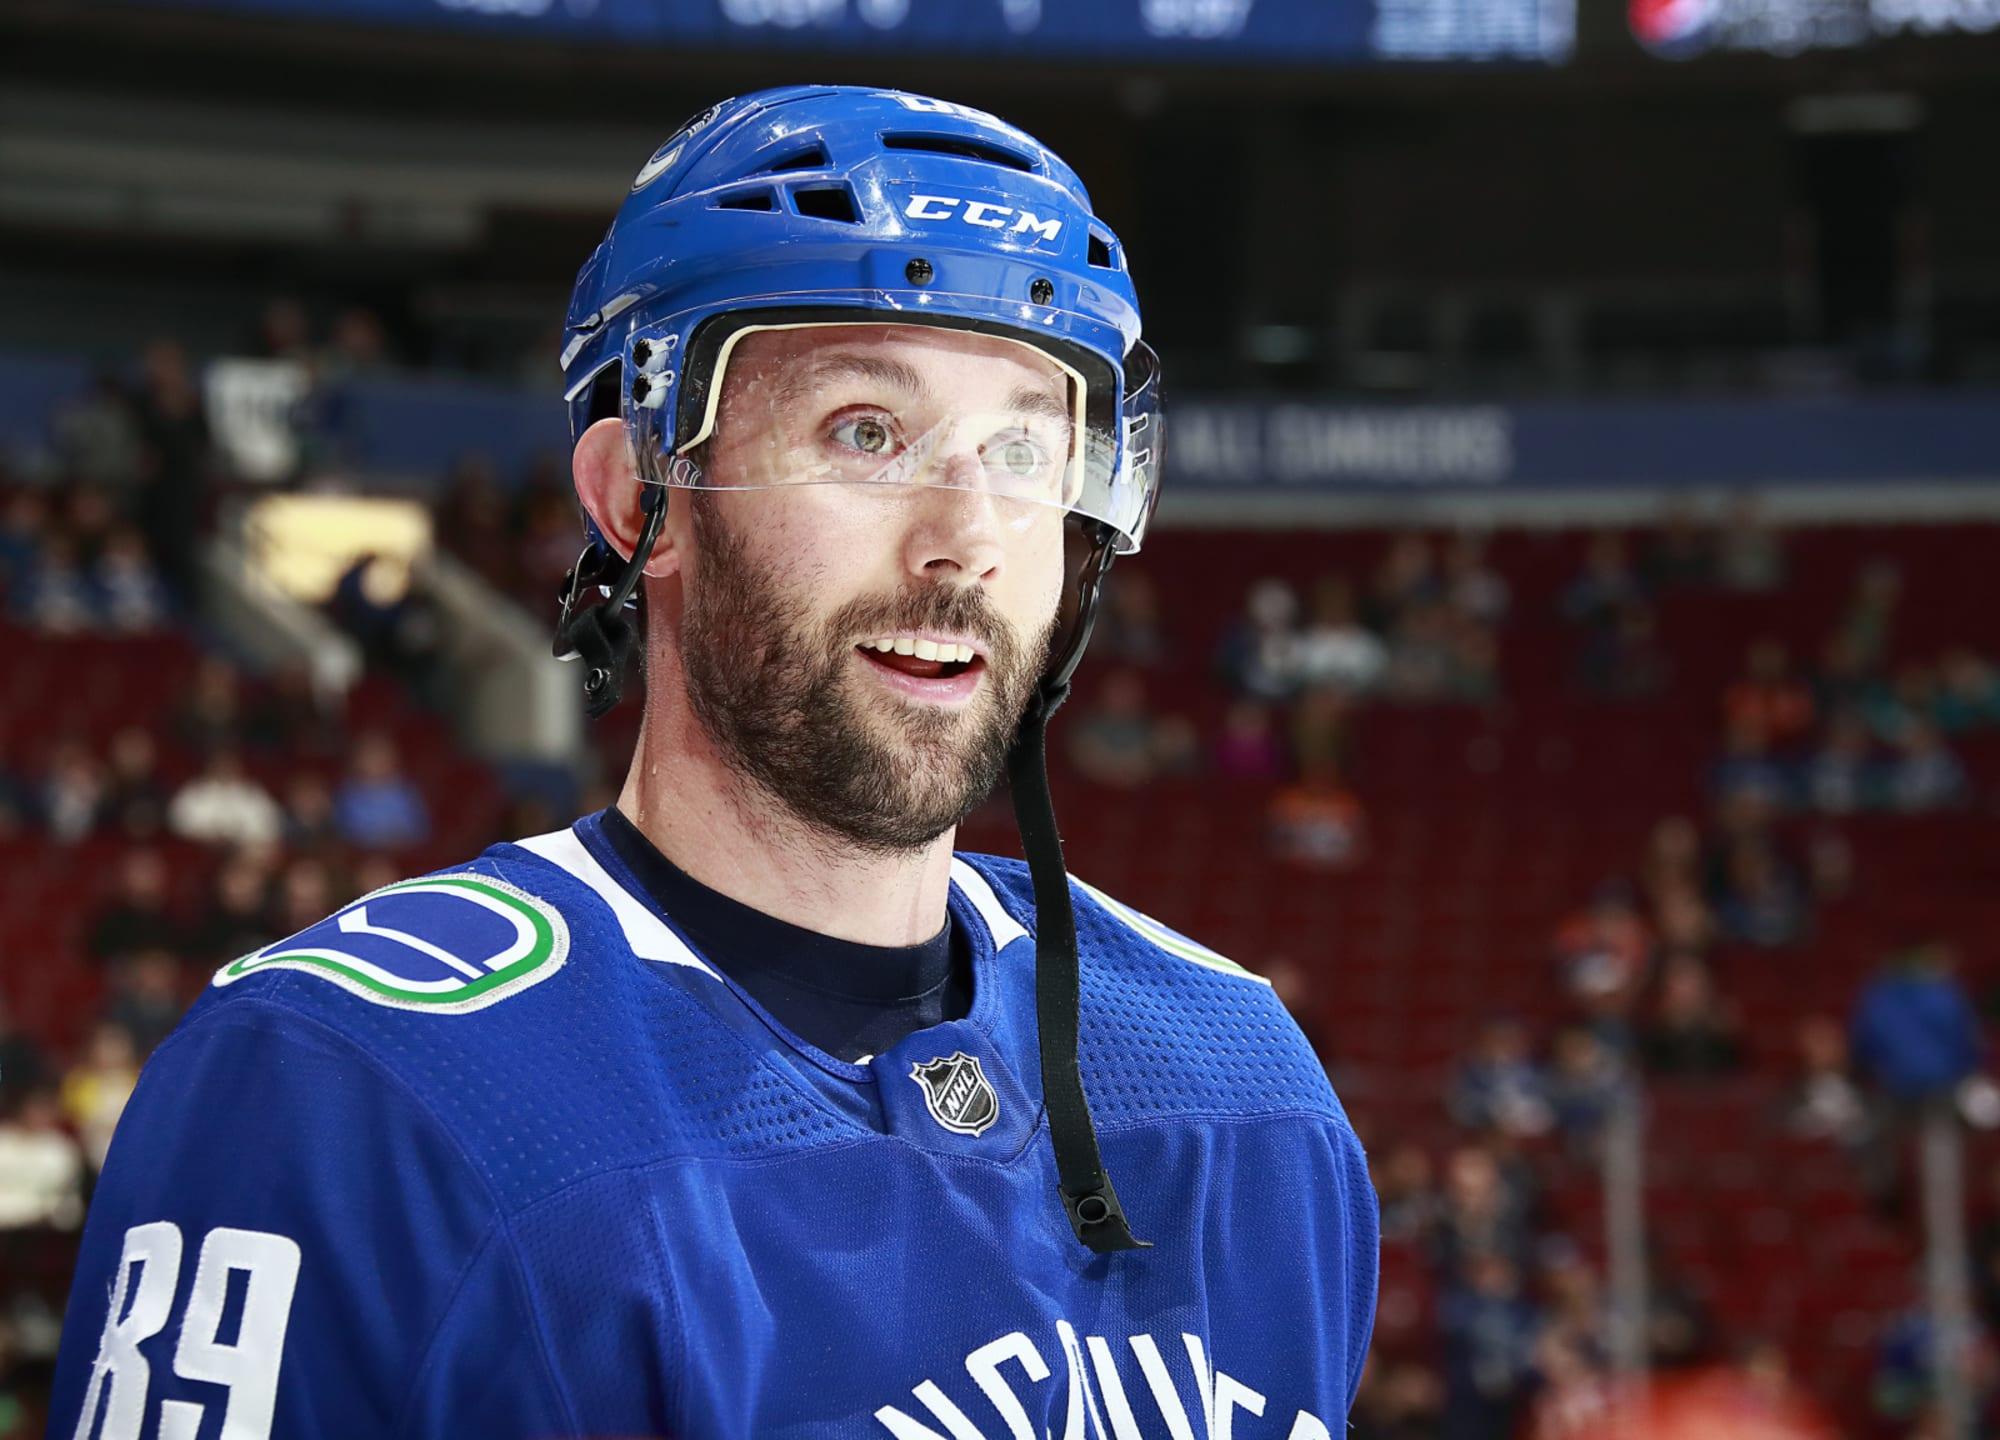 Vancouver Canucks Sam Gagner Preparing For Leadership Role